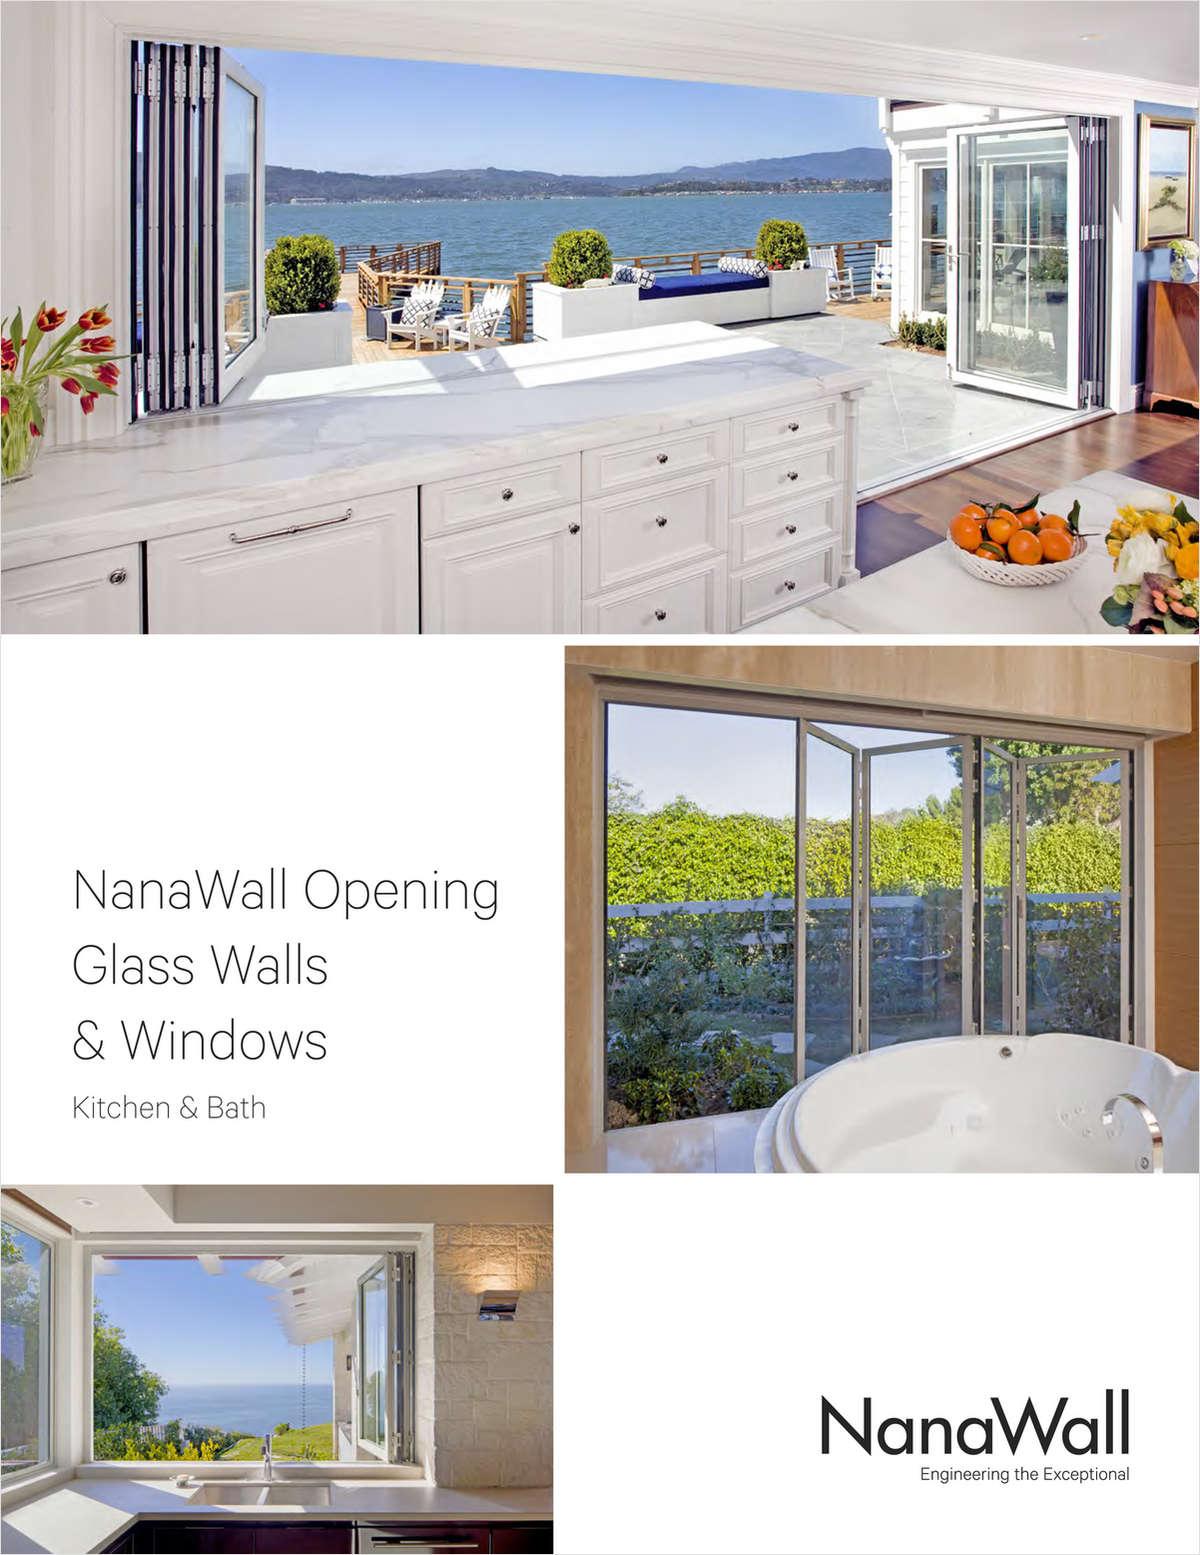 NanaWall Opening Glass Walls & Windows for Kitchens & Baths